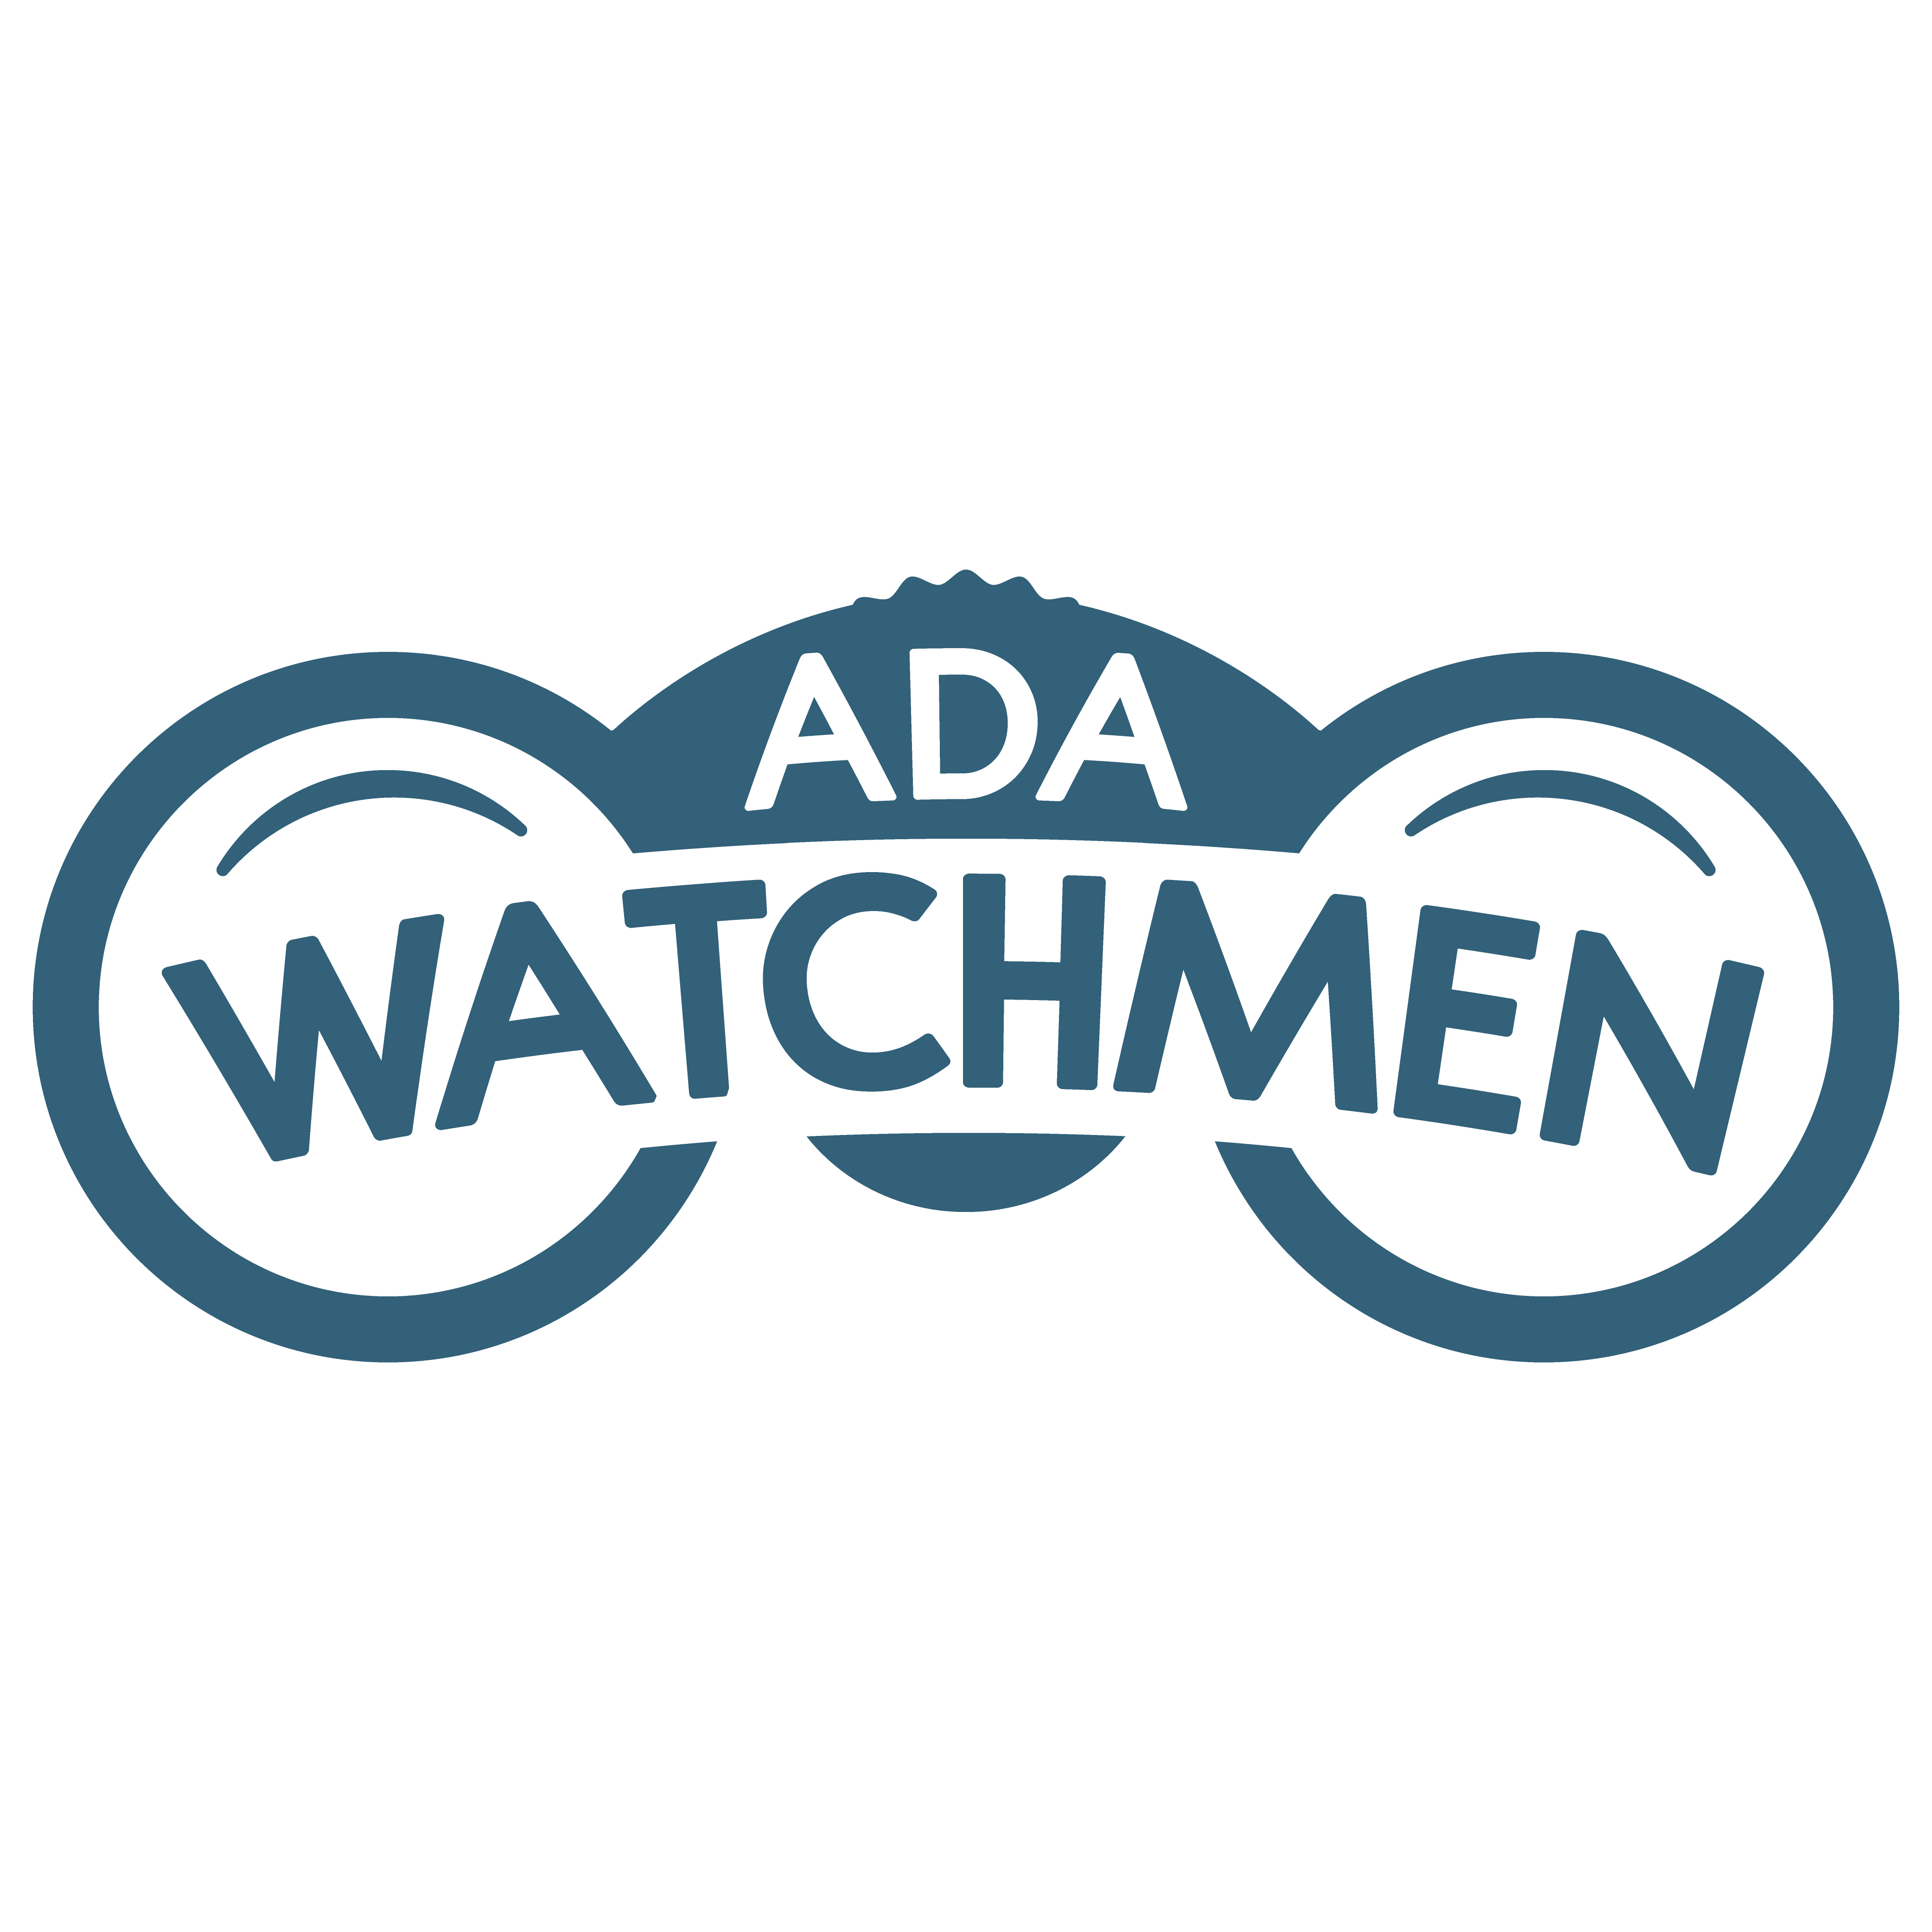 ADA Watchmen (Organization)